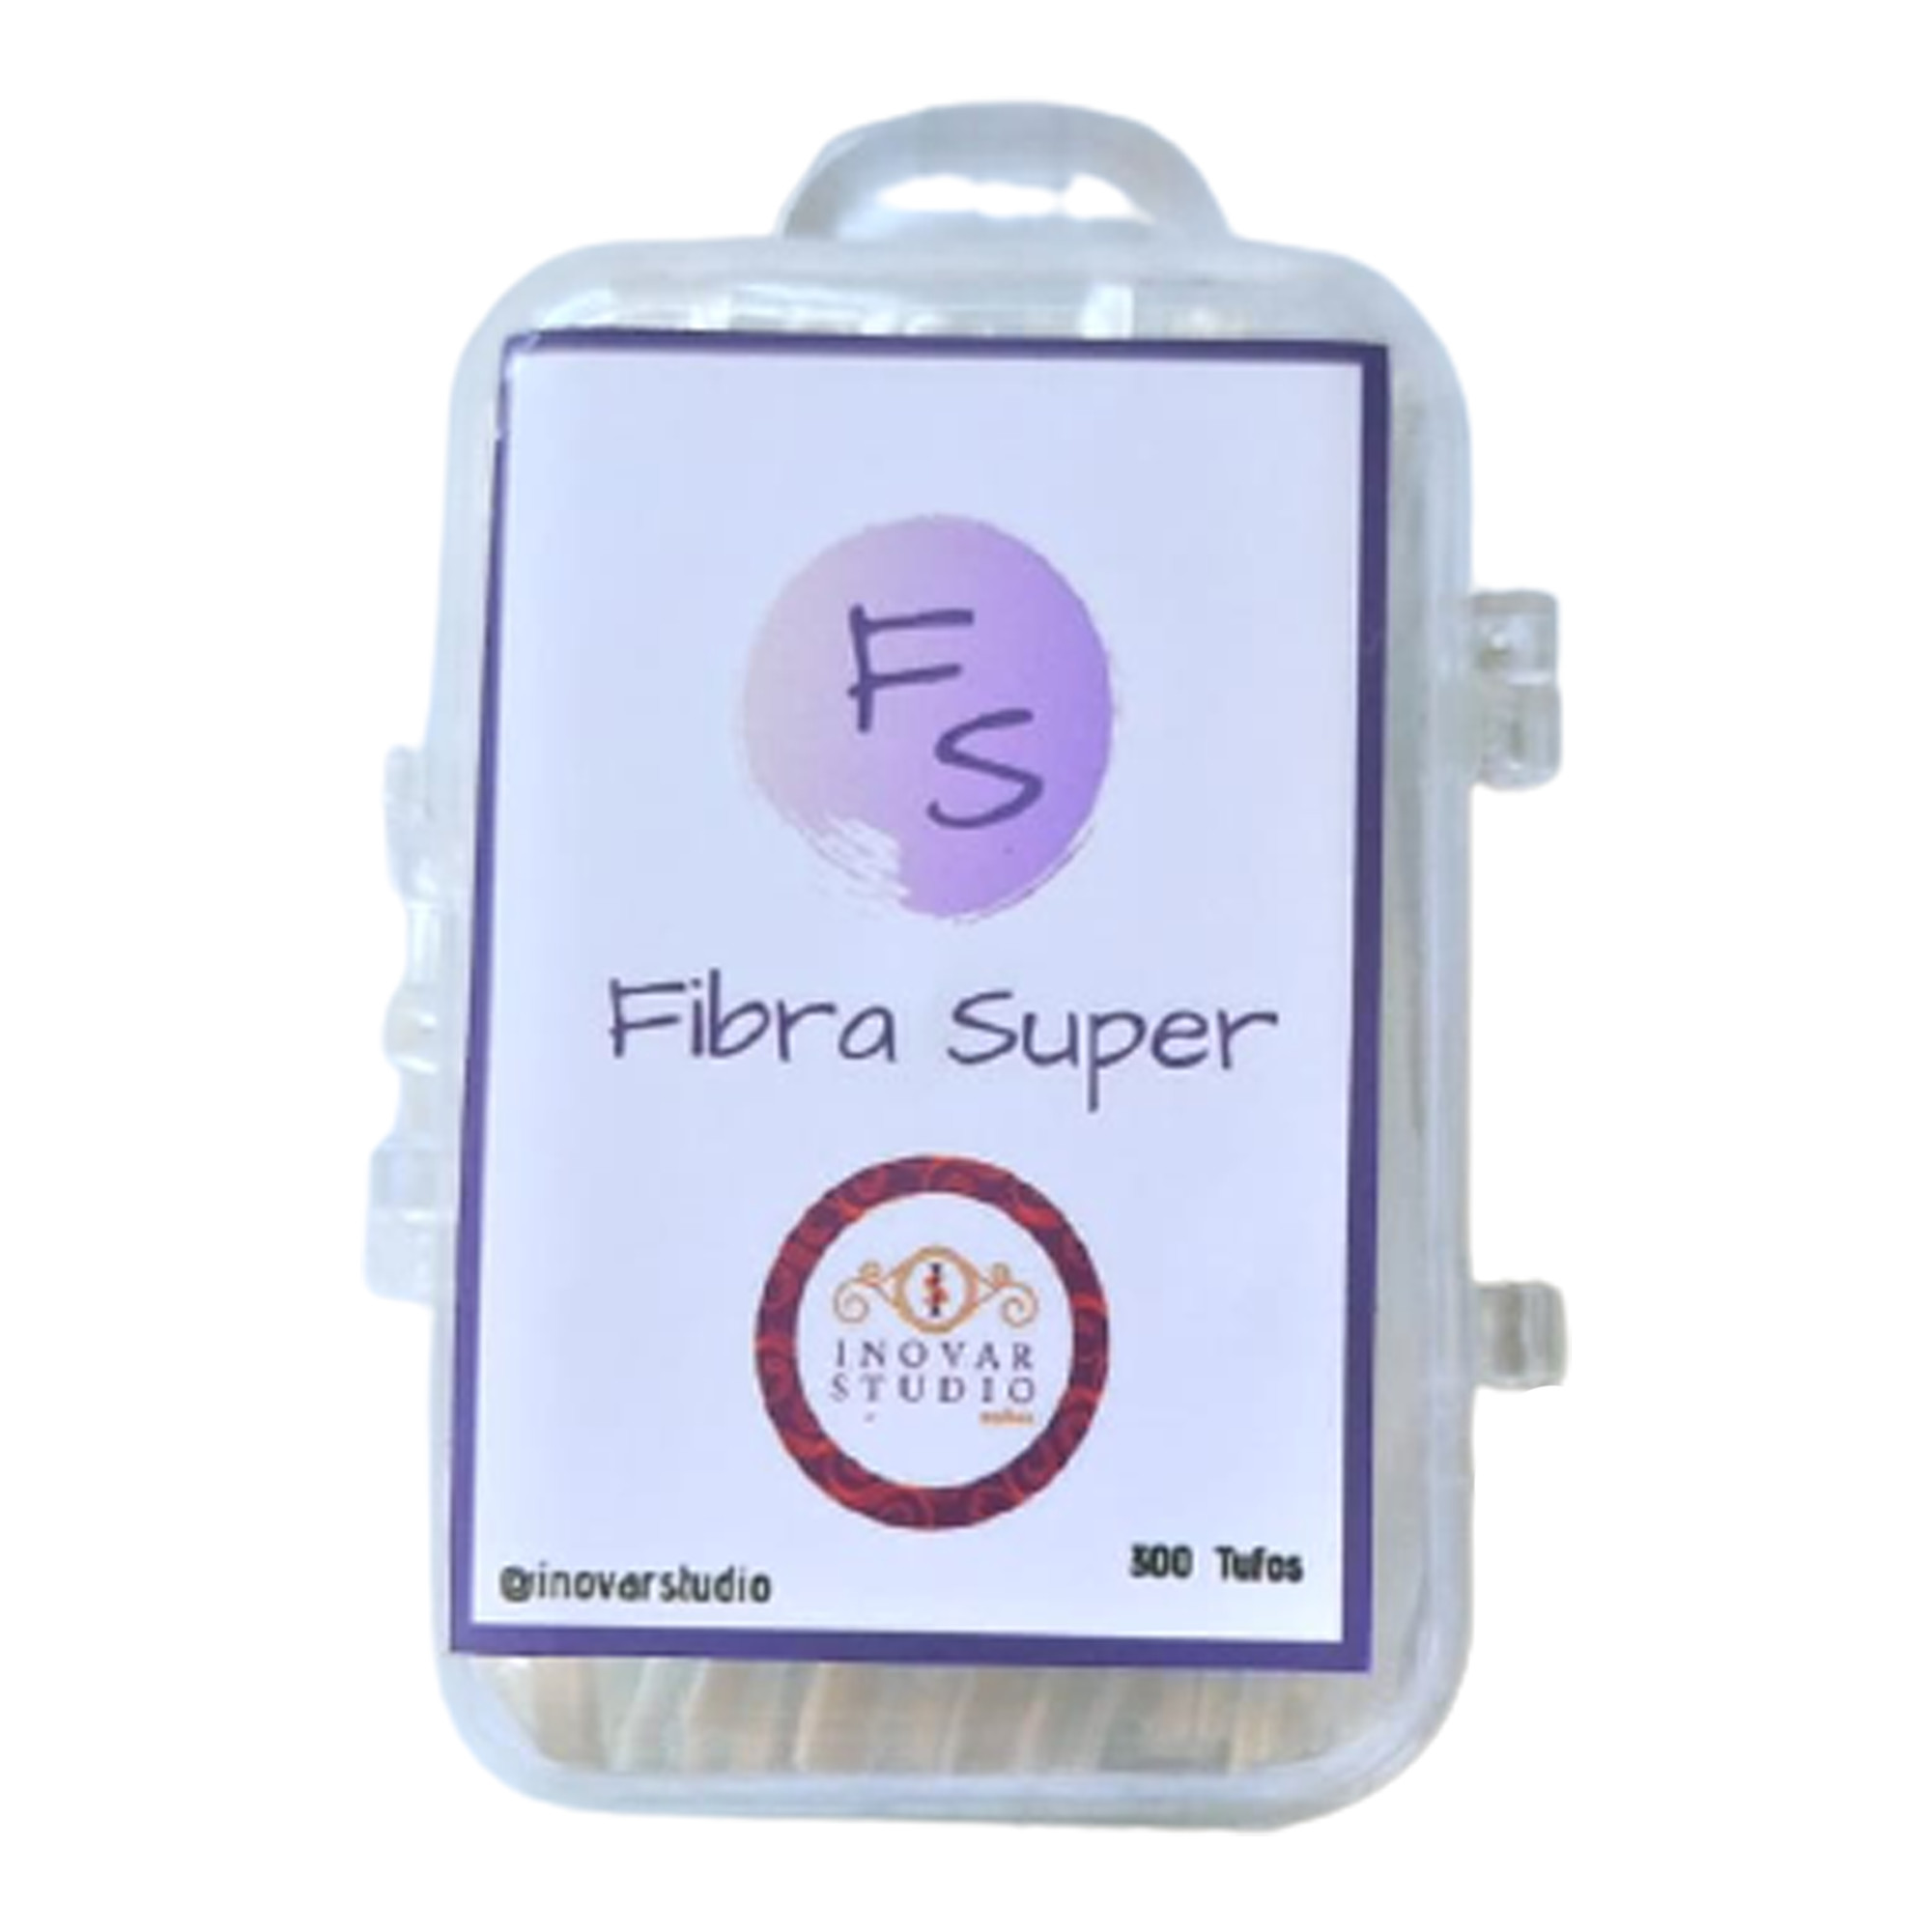 Maletinha Fibra Super Tufos - 300 tufos